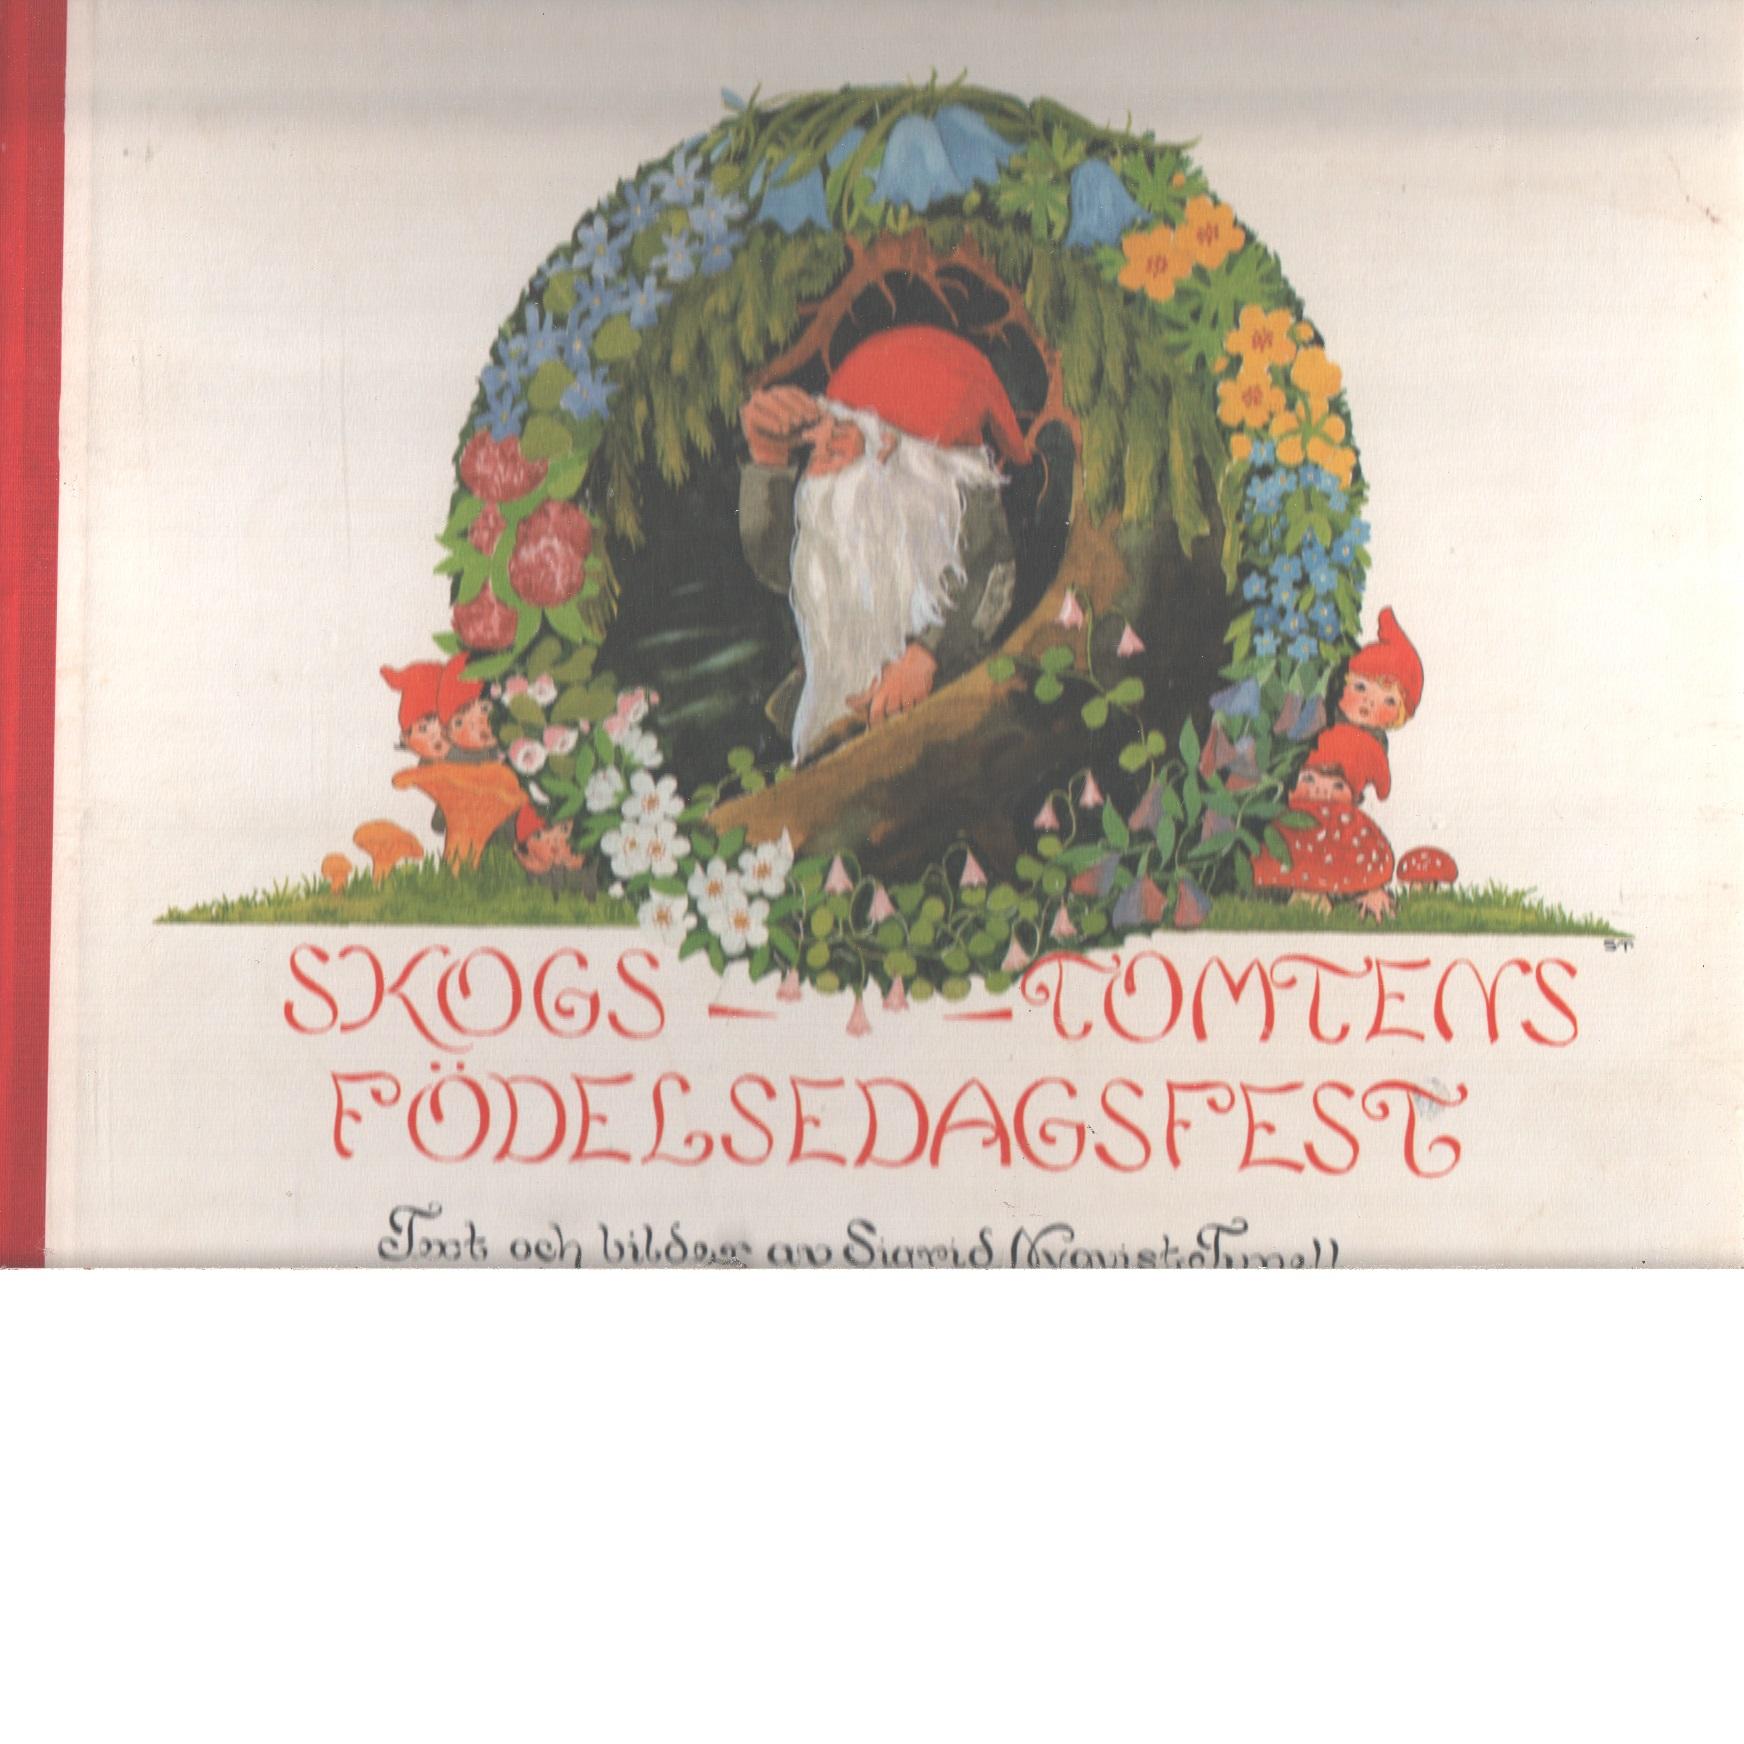 Skogs-tomtens födelsedagsfest - Nyqvist-Tunell, Sigrid